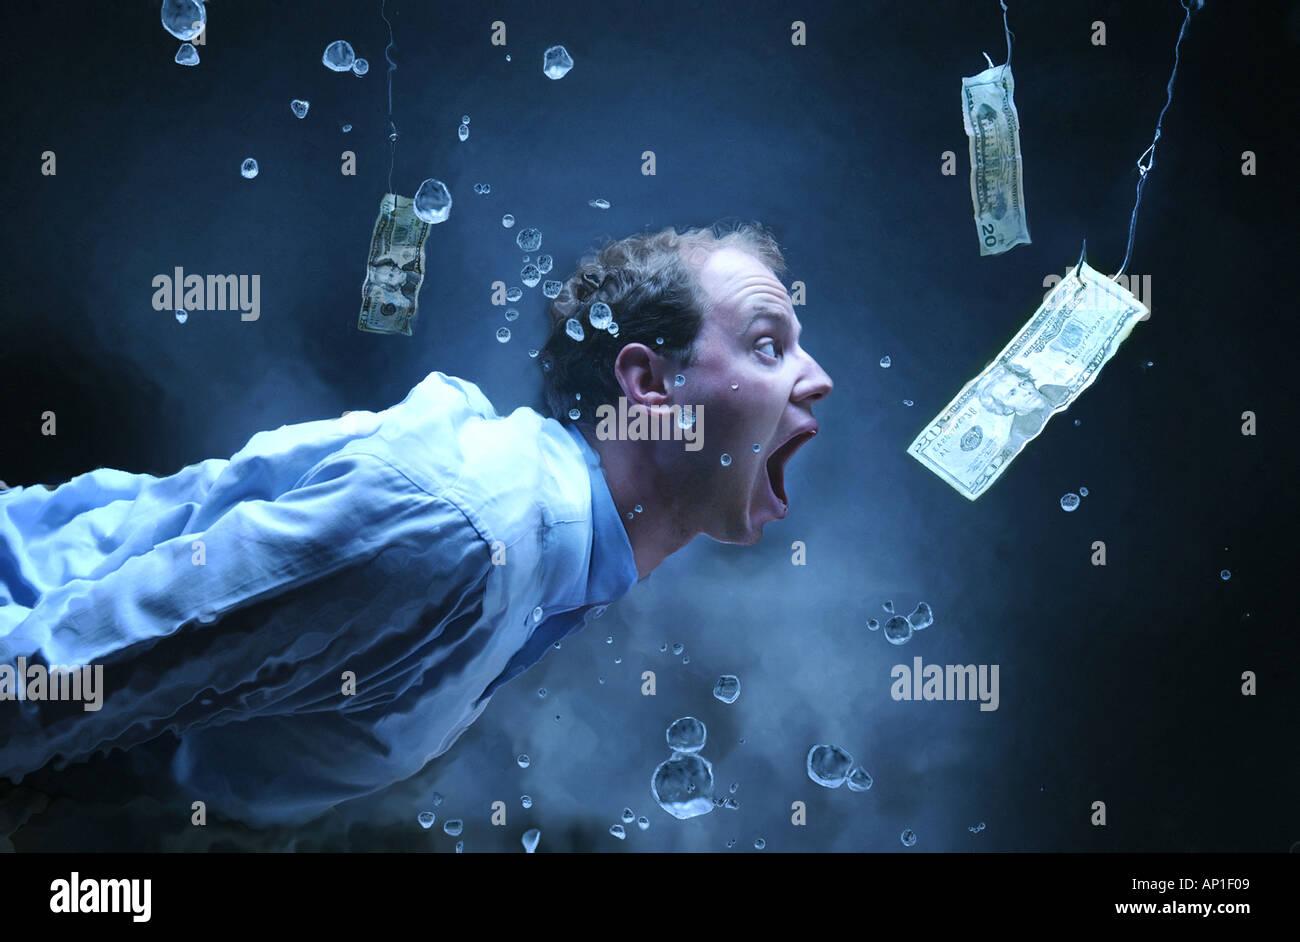 'business humor' concept man swimming underwater after money on fishing hook. Sucker deals. 'High Interest' - Stock Image